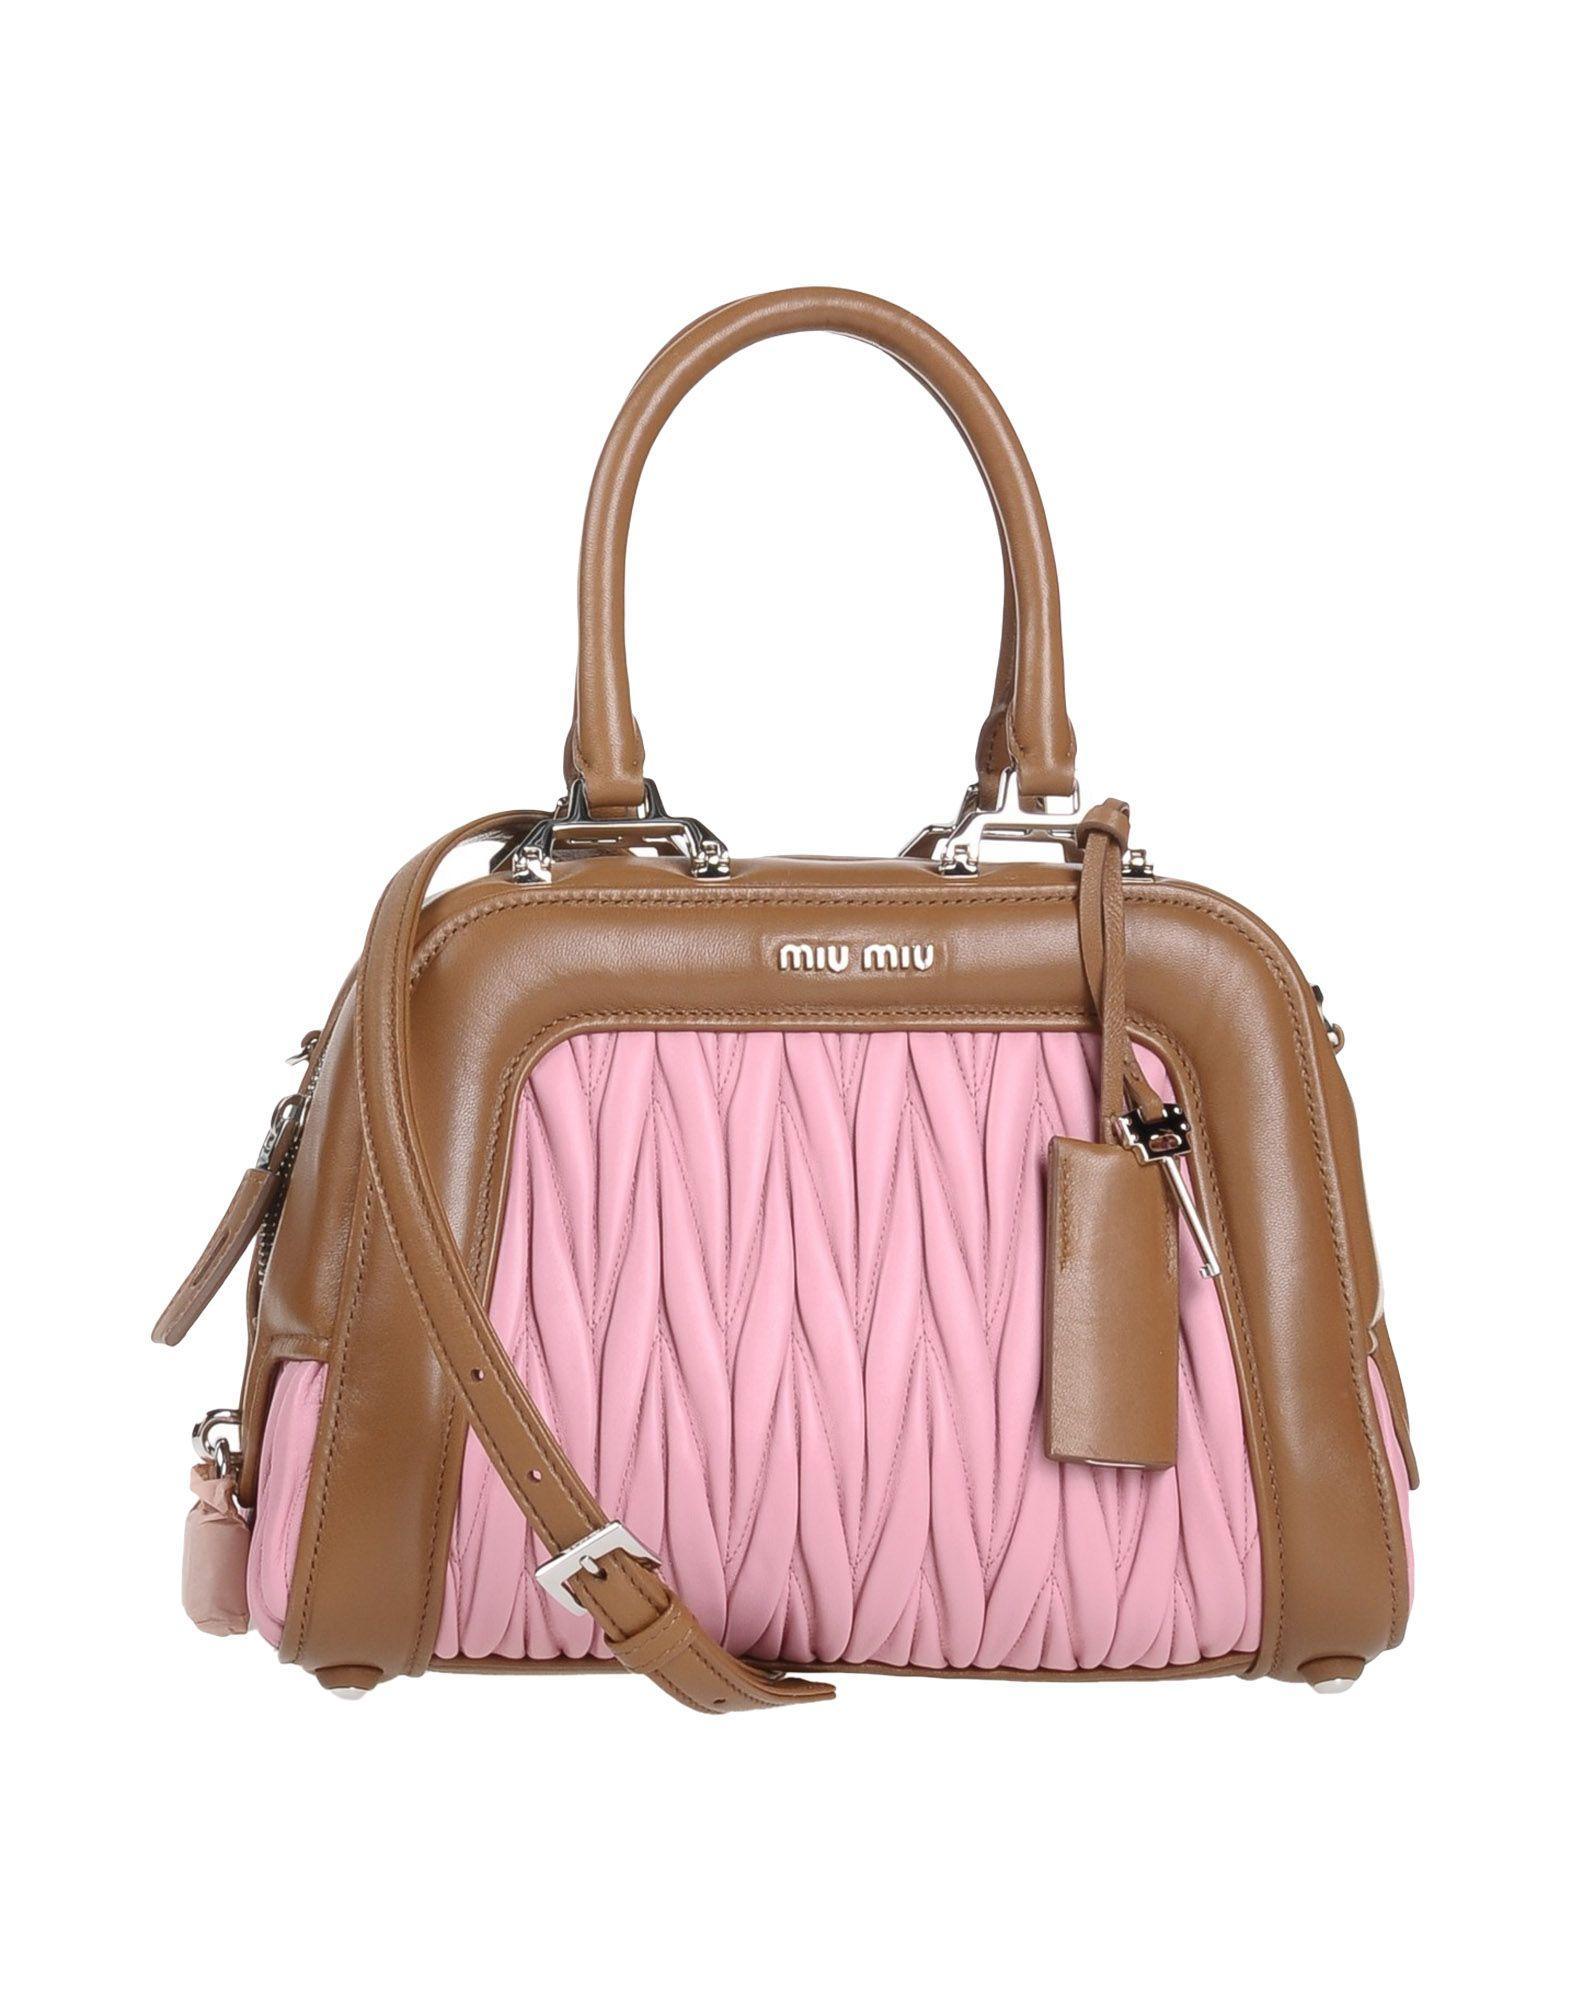 Miu Miu Handbags In Camel